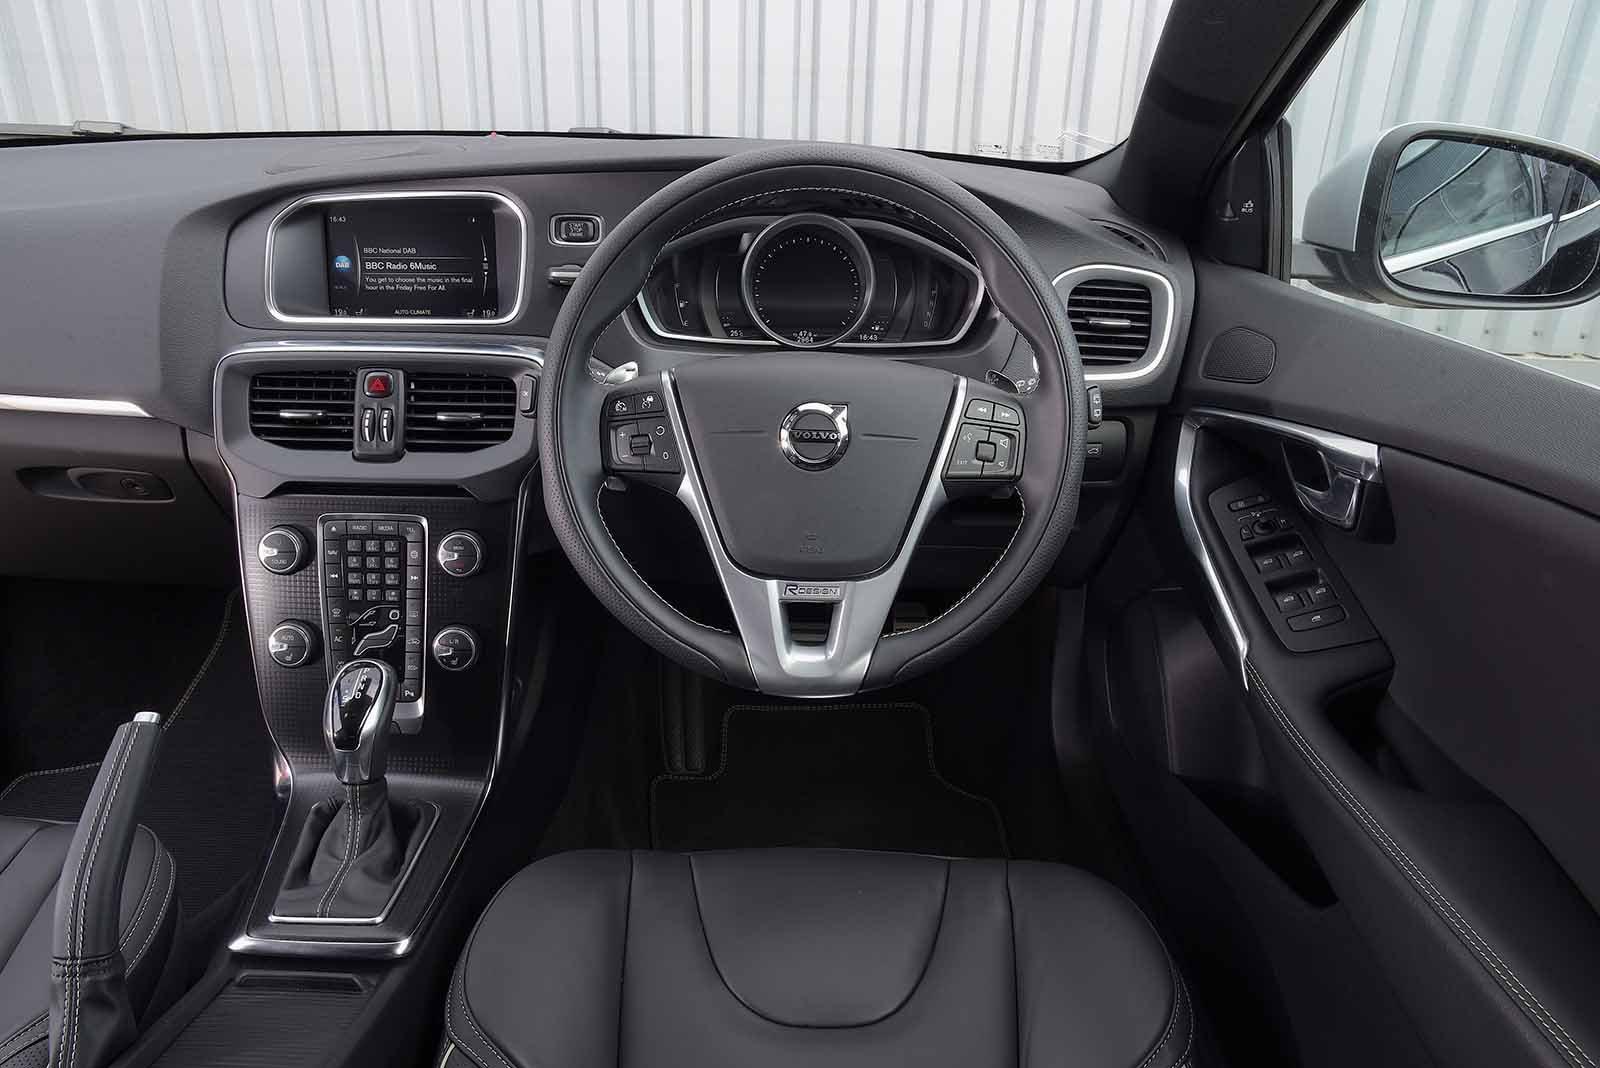 Volvo V40 Interior, Sat Nav, Dashboard | What Car?